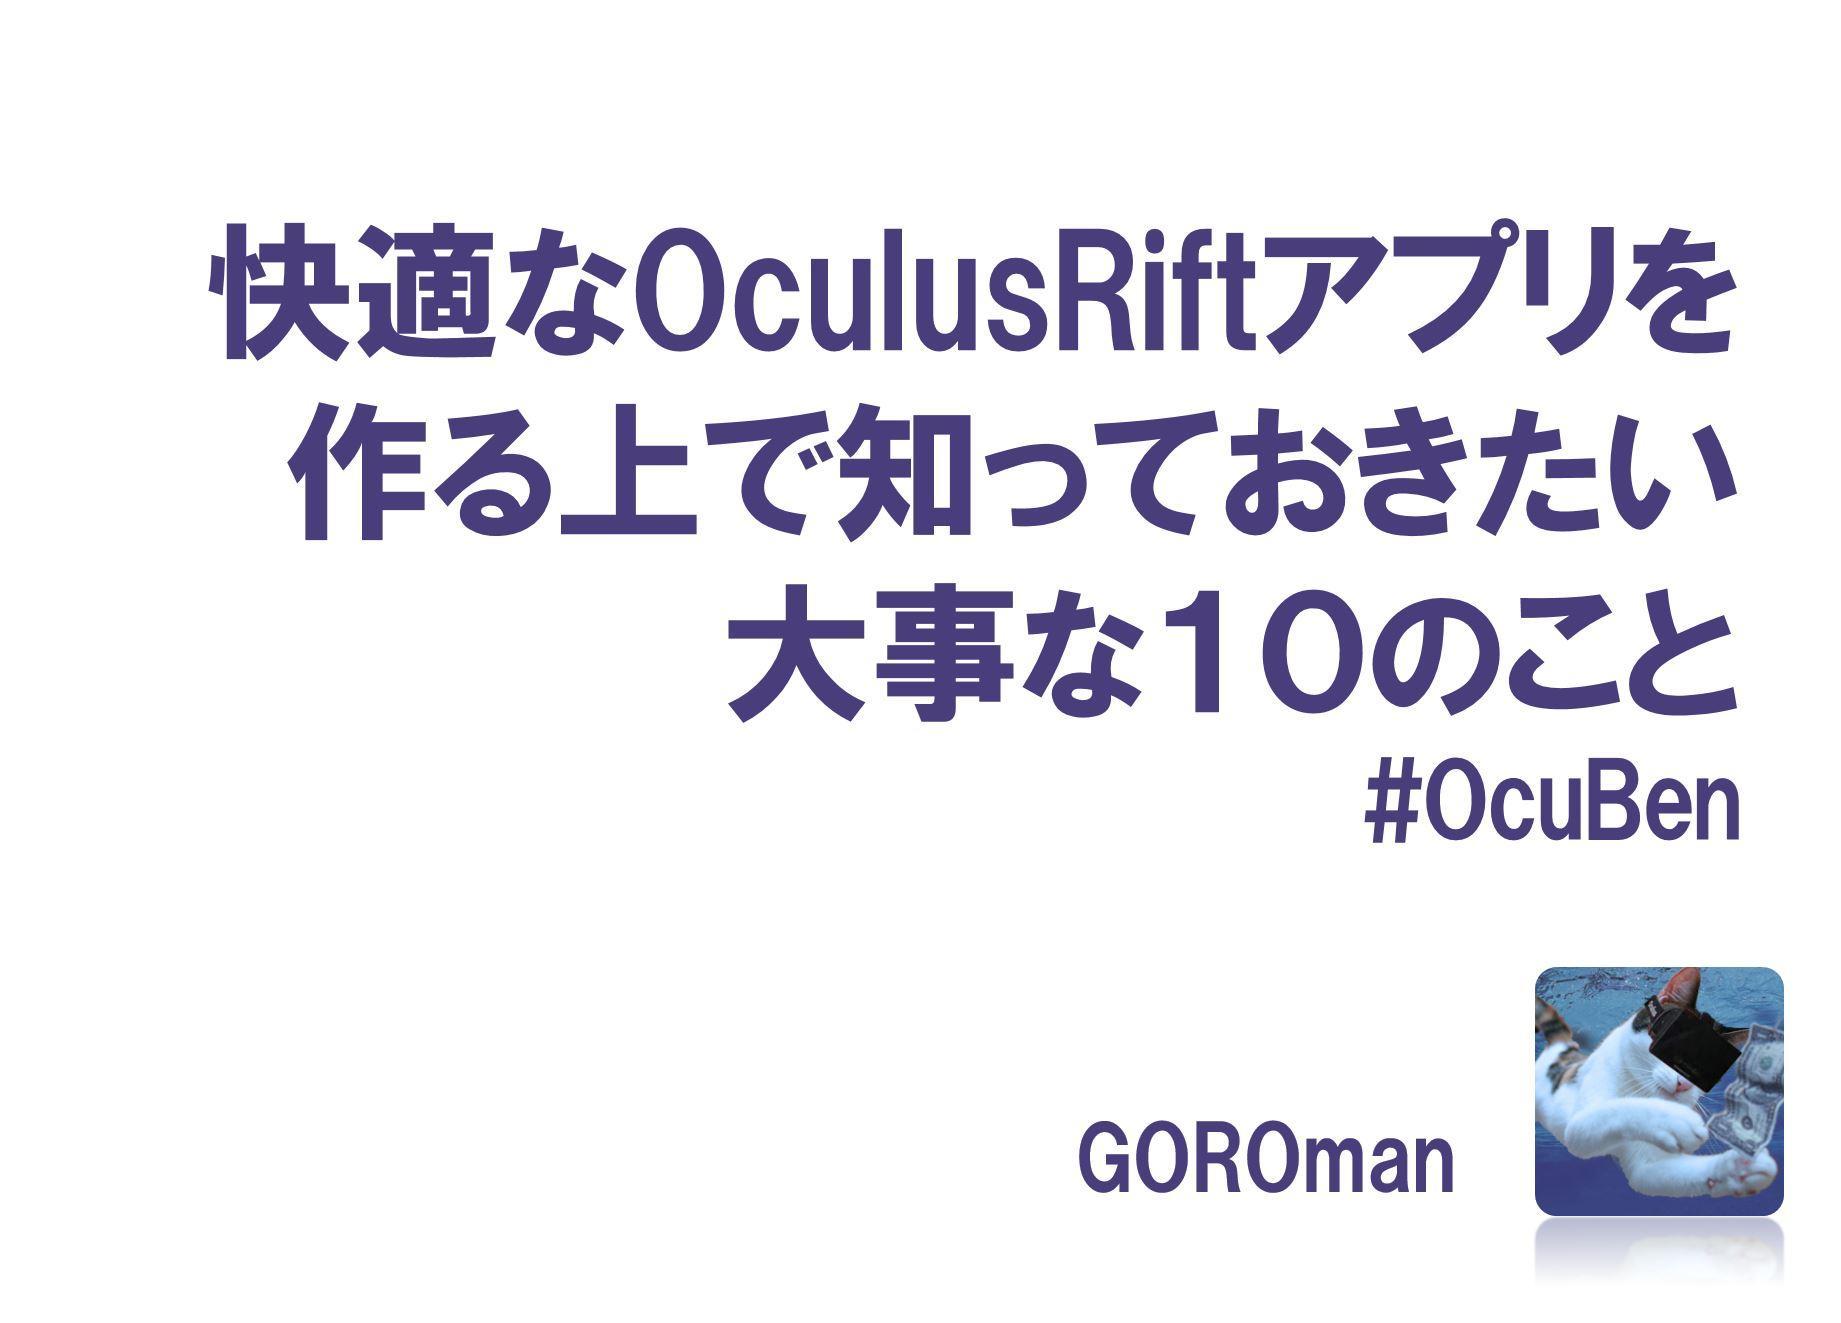 Oculus Rift勉強会 #01 #OcuBen